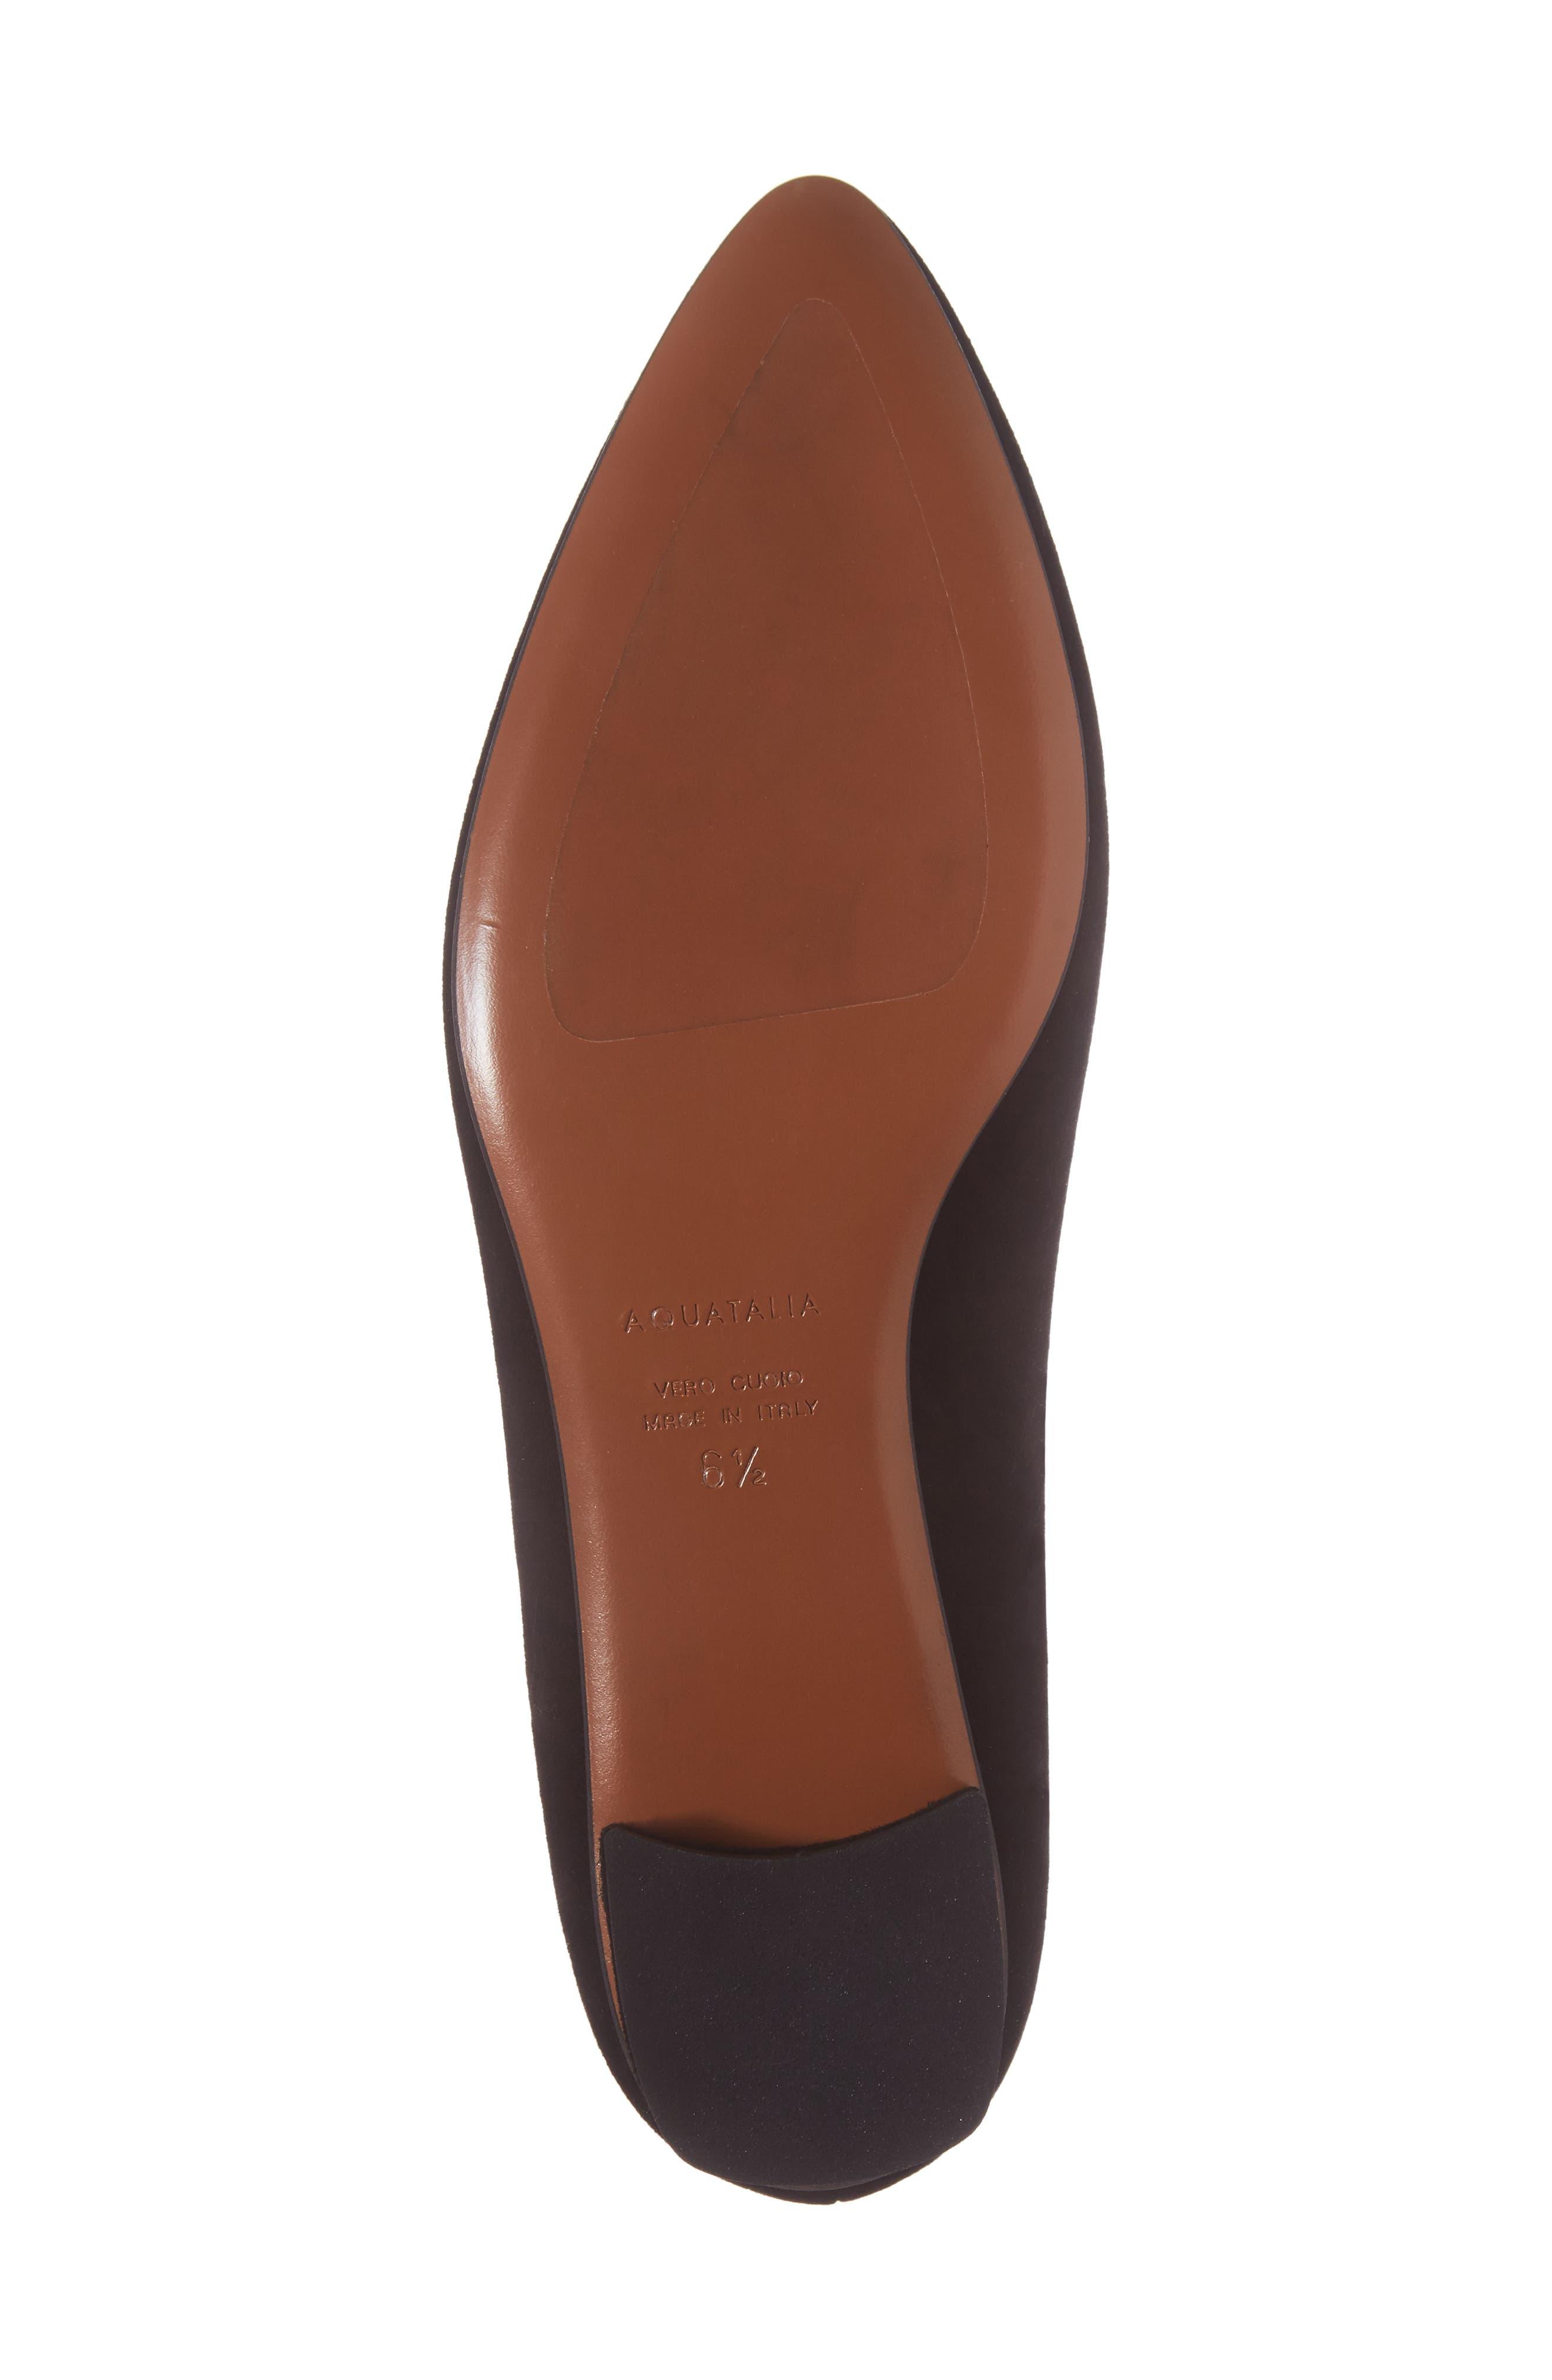 Perla Weatherproof Ballerina Shoe,                             Alternate thumbnail 6, color,                             001